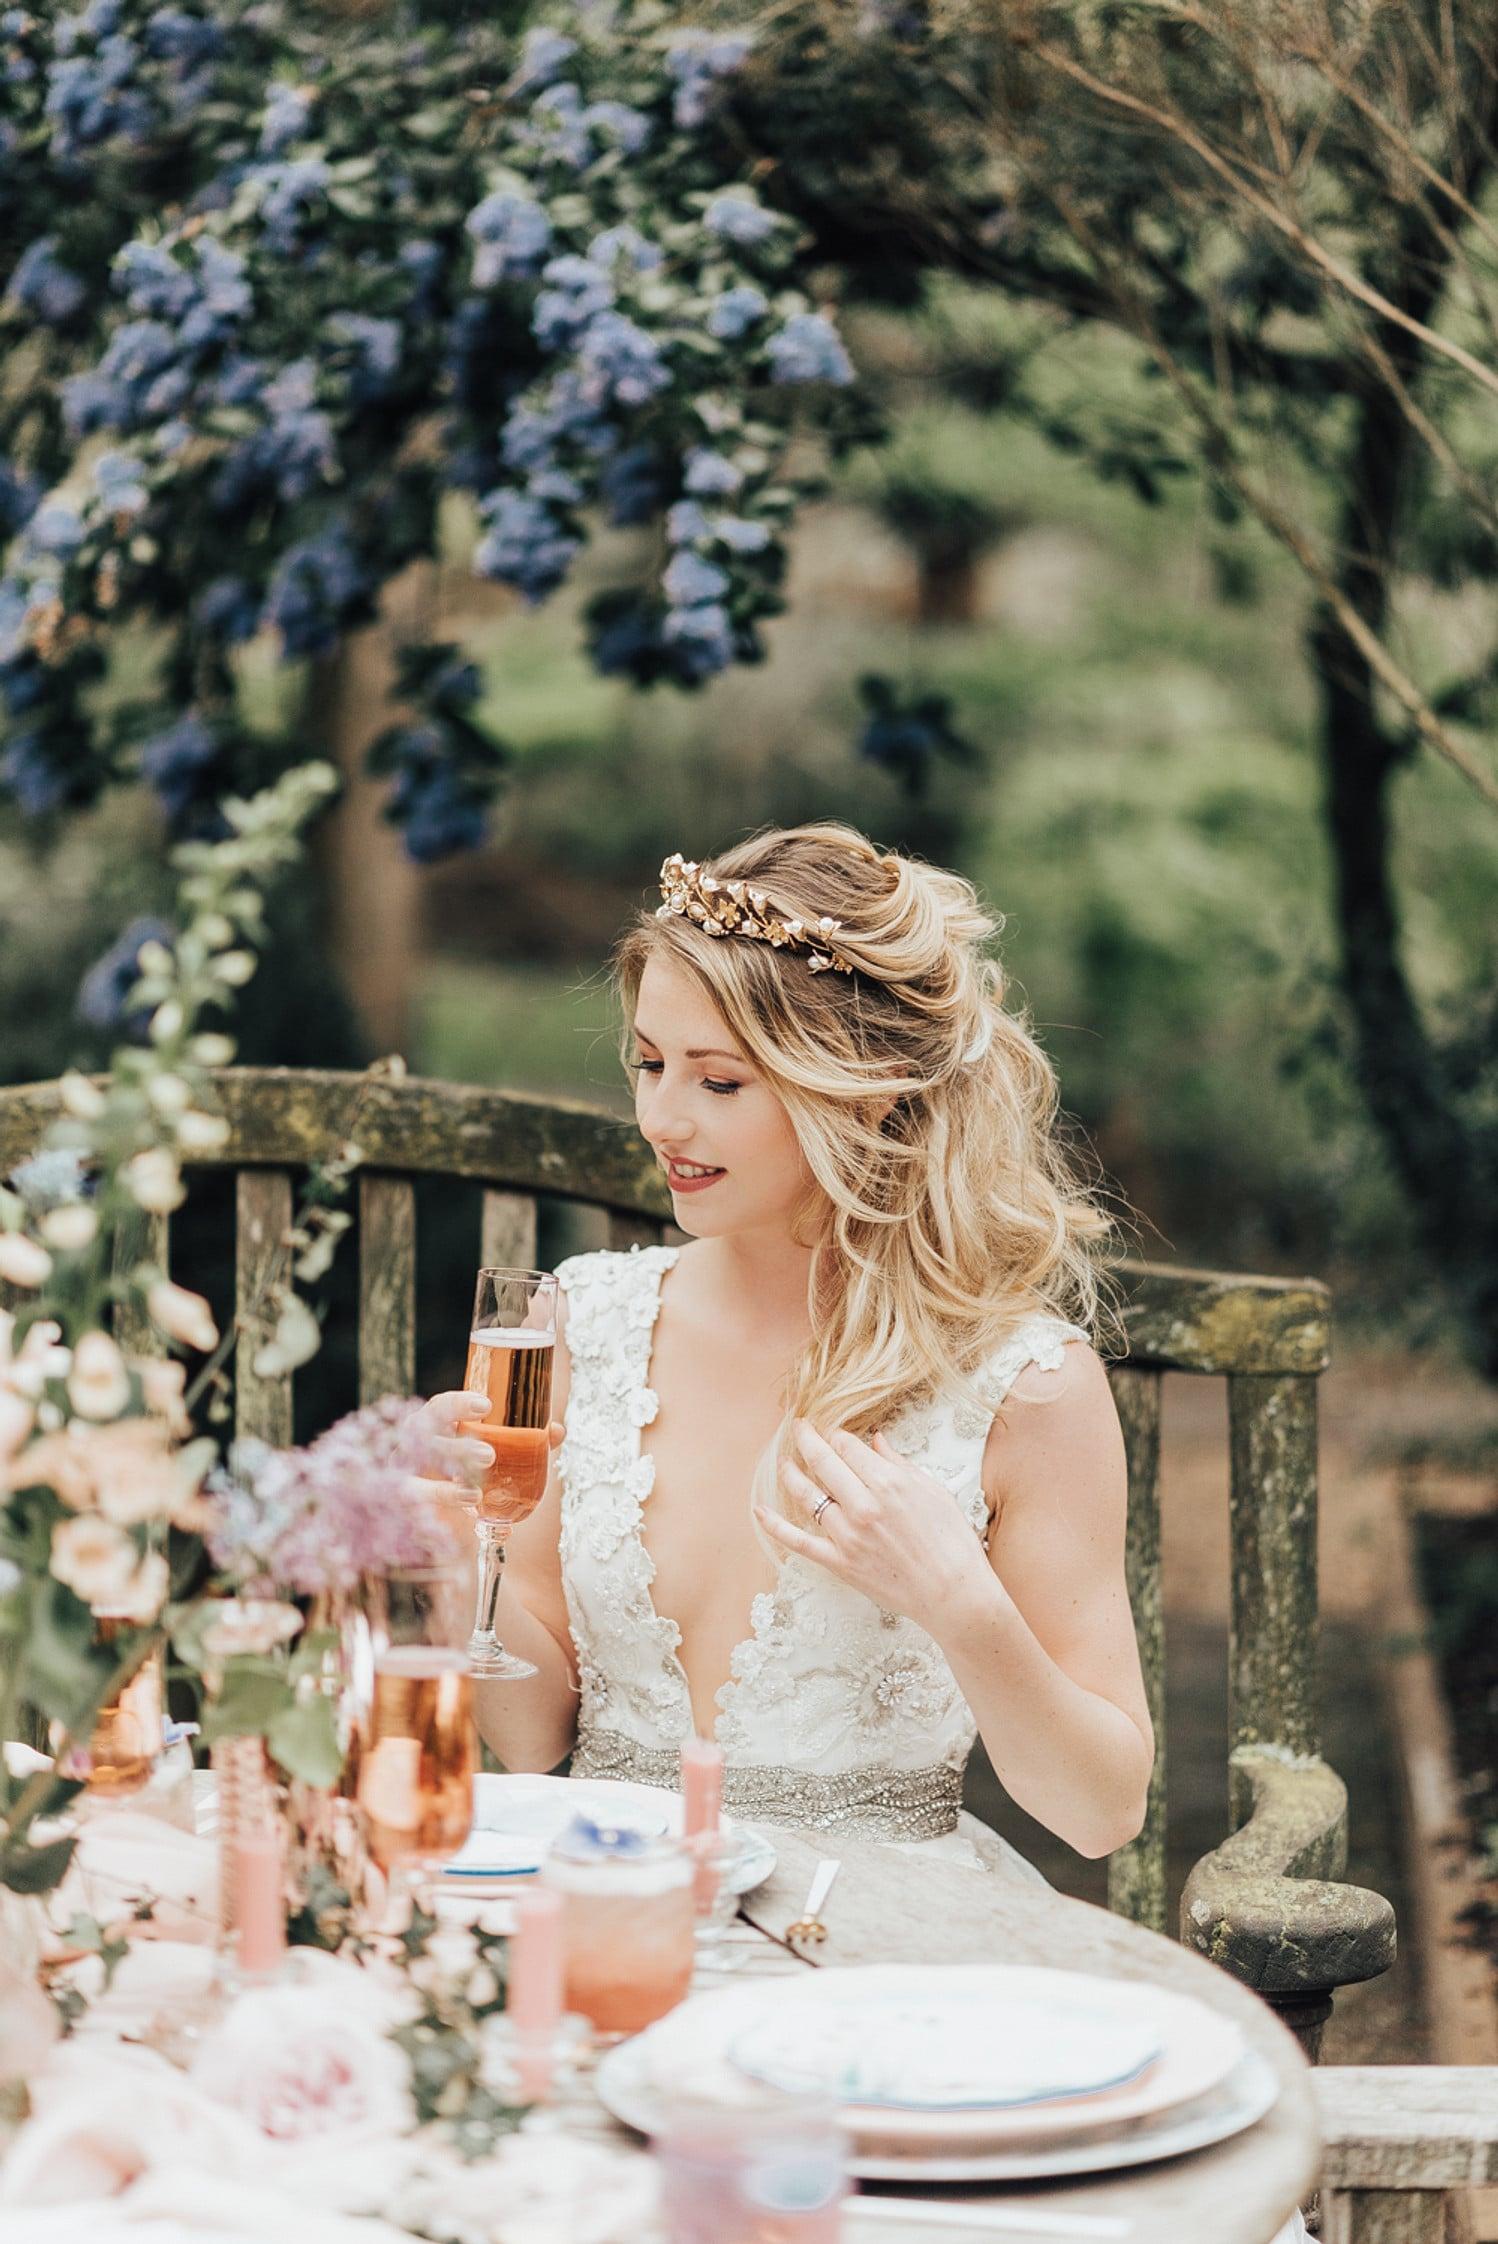 Sleeping Beauty Themed Wedding Ideas   POPSUGAR Love & Sex